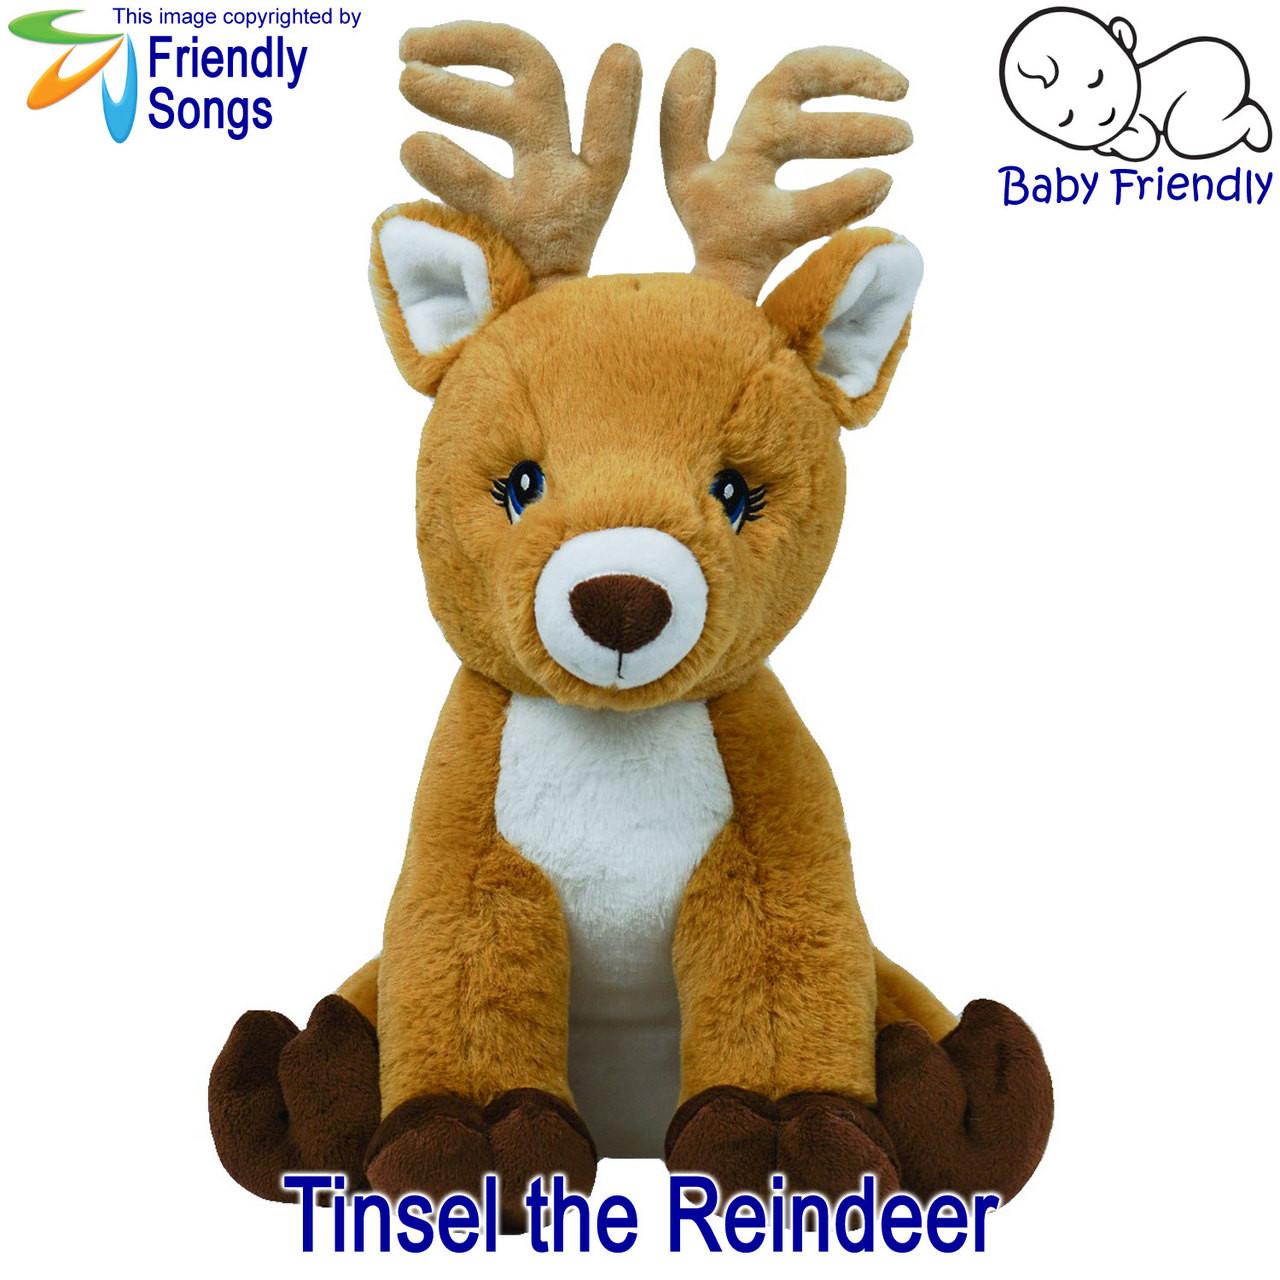 Jessica Naomee standard name - personalized singing stuffed animal plush